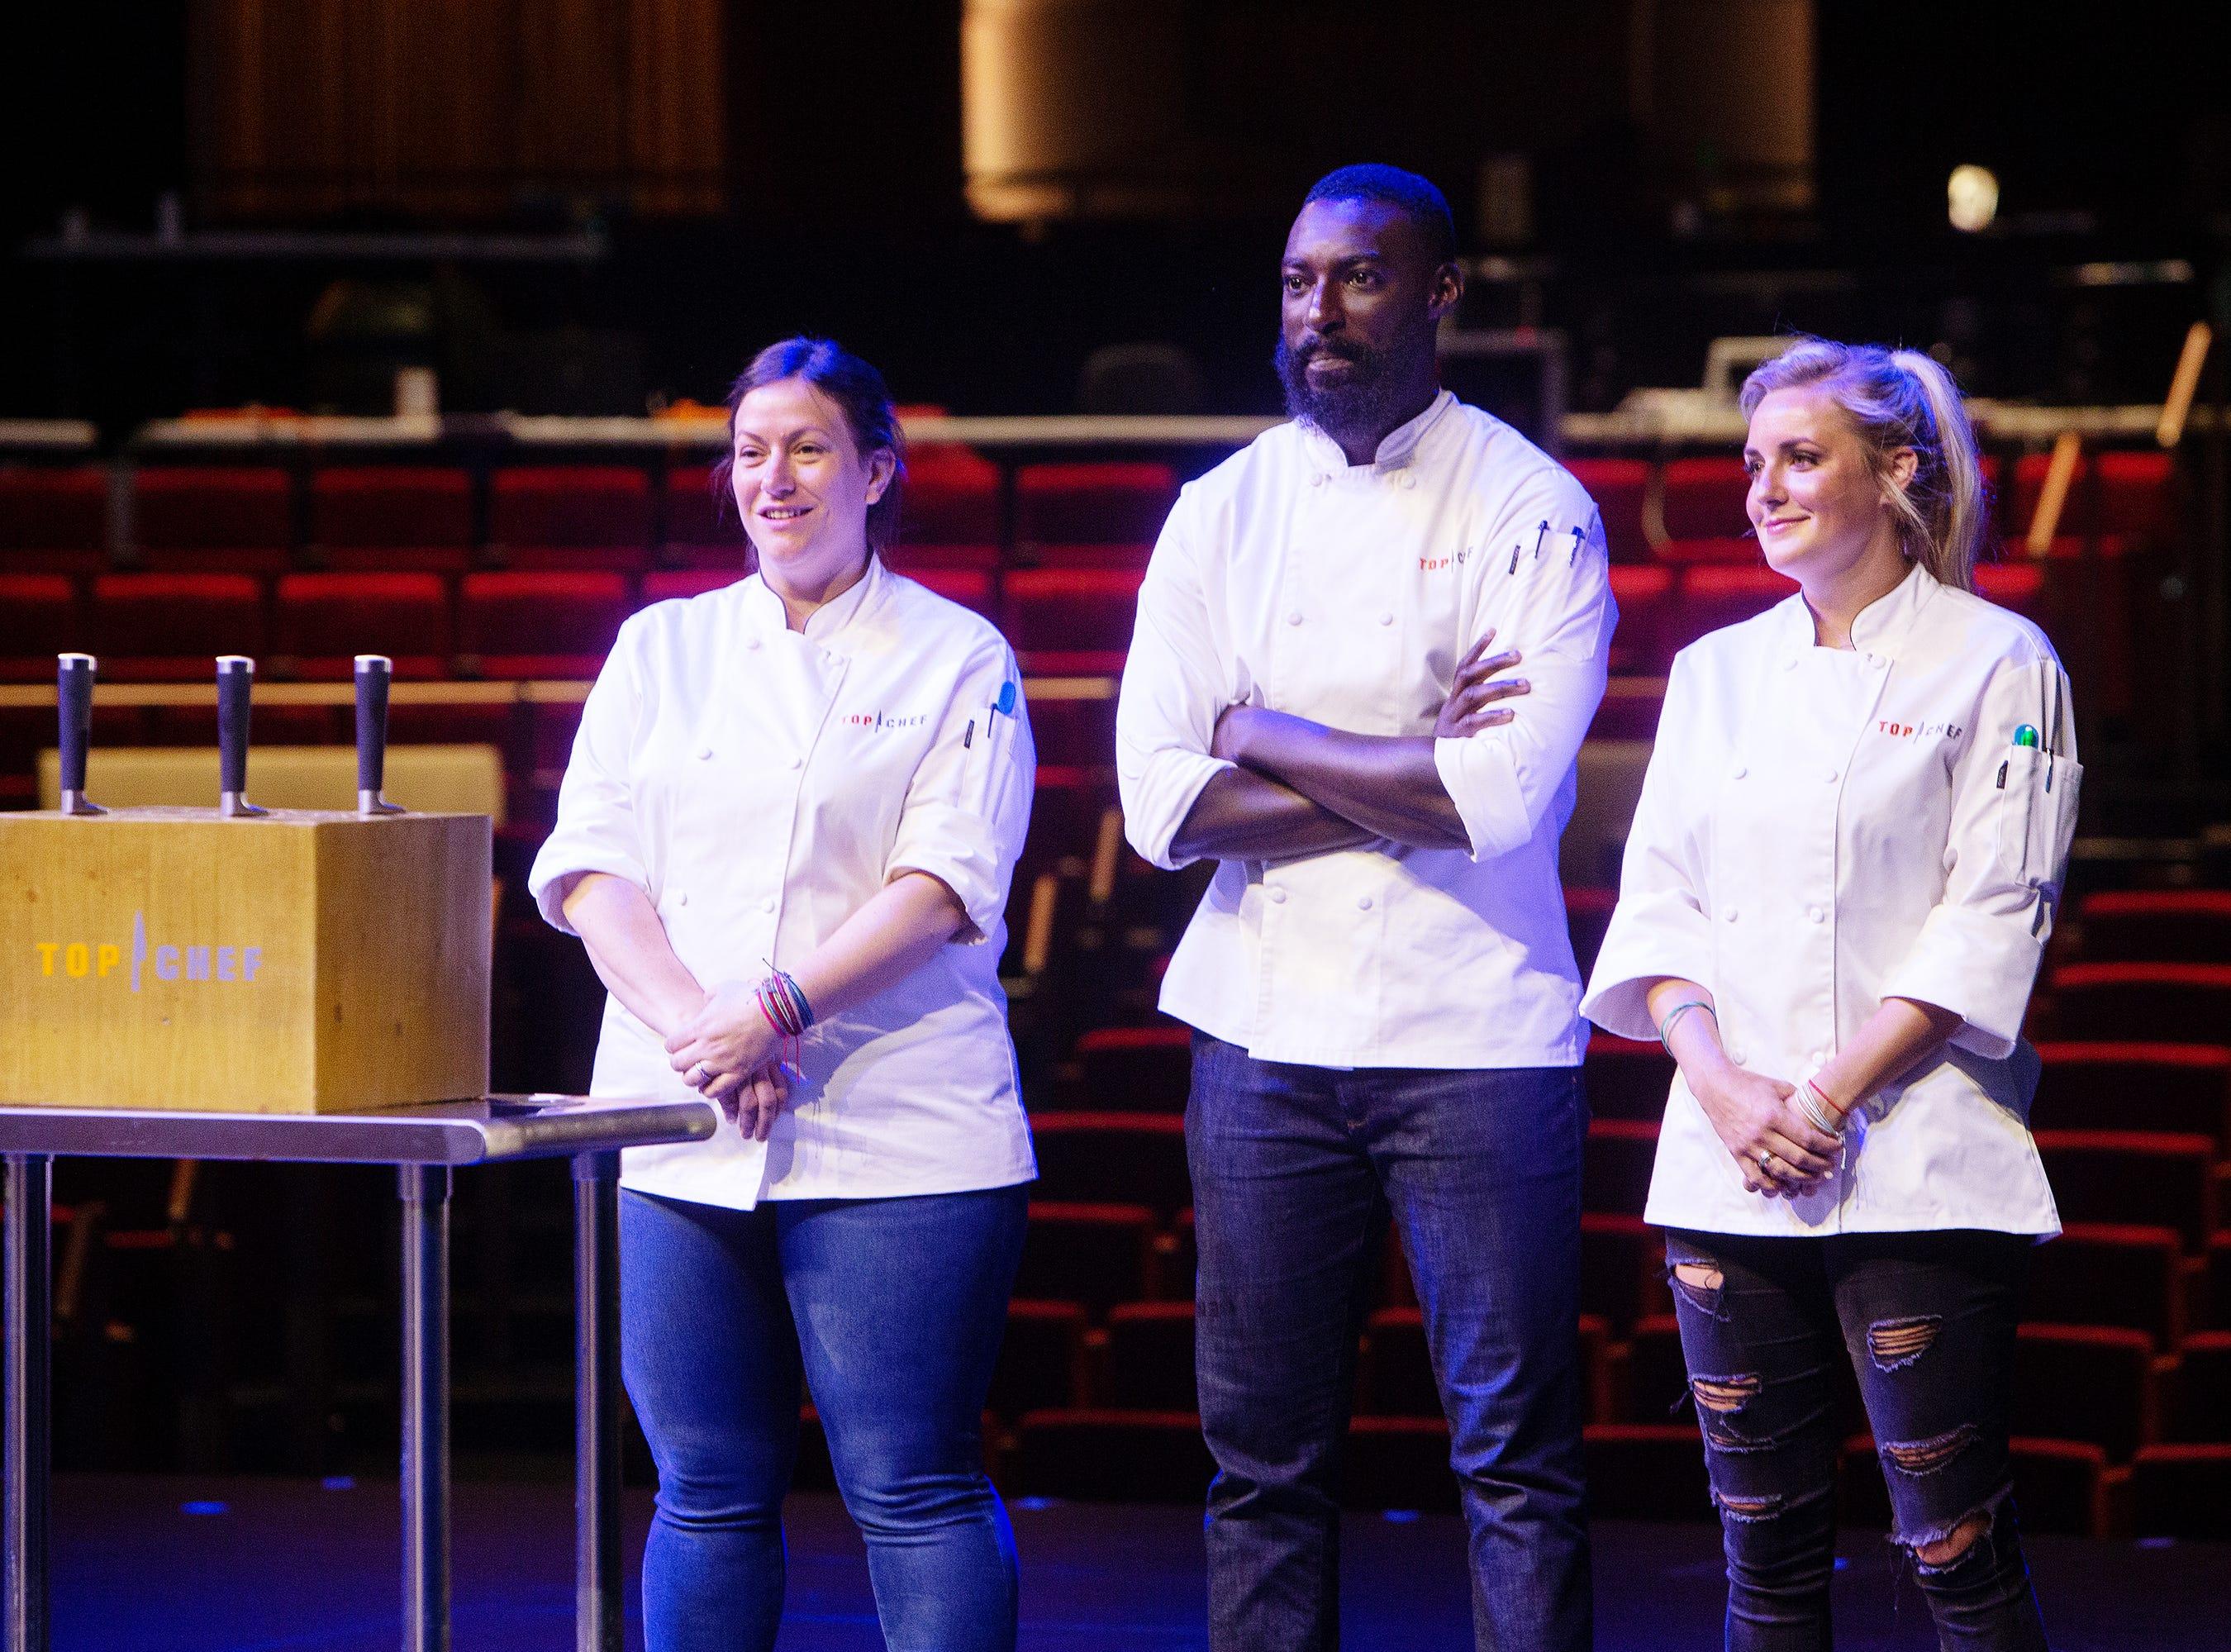 'Top Chef' contestants Sara Bradley, Eric Adjepong and Kelsey Barnard Clark wait for challenge instructions on episode 15 of season 16.